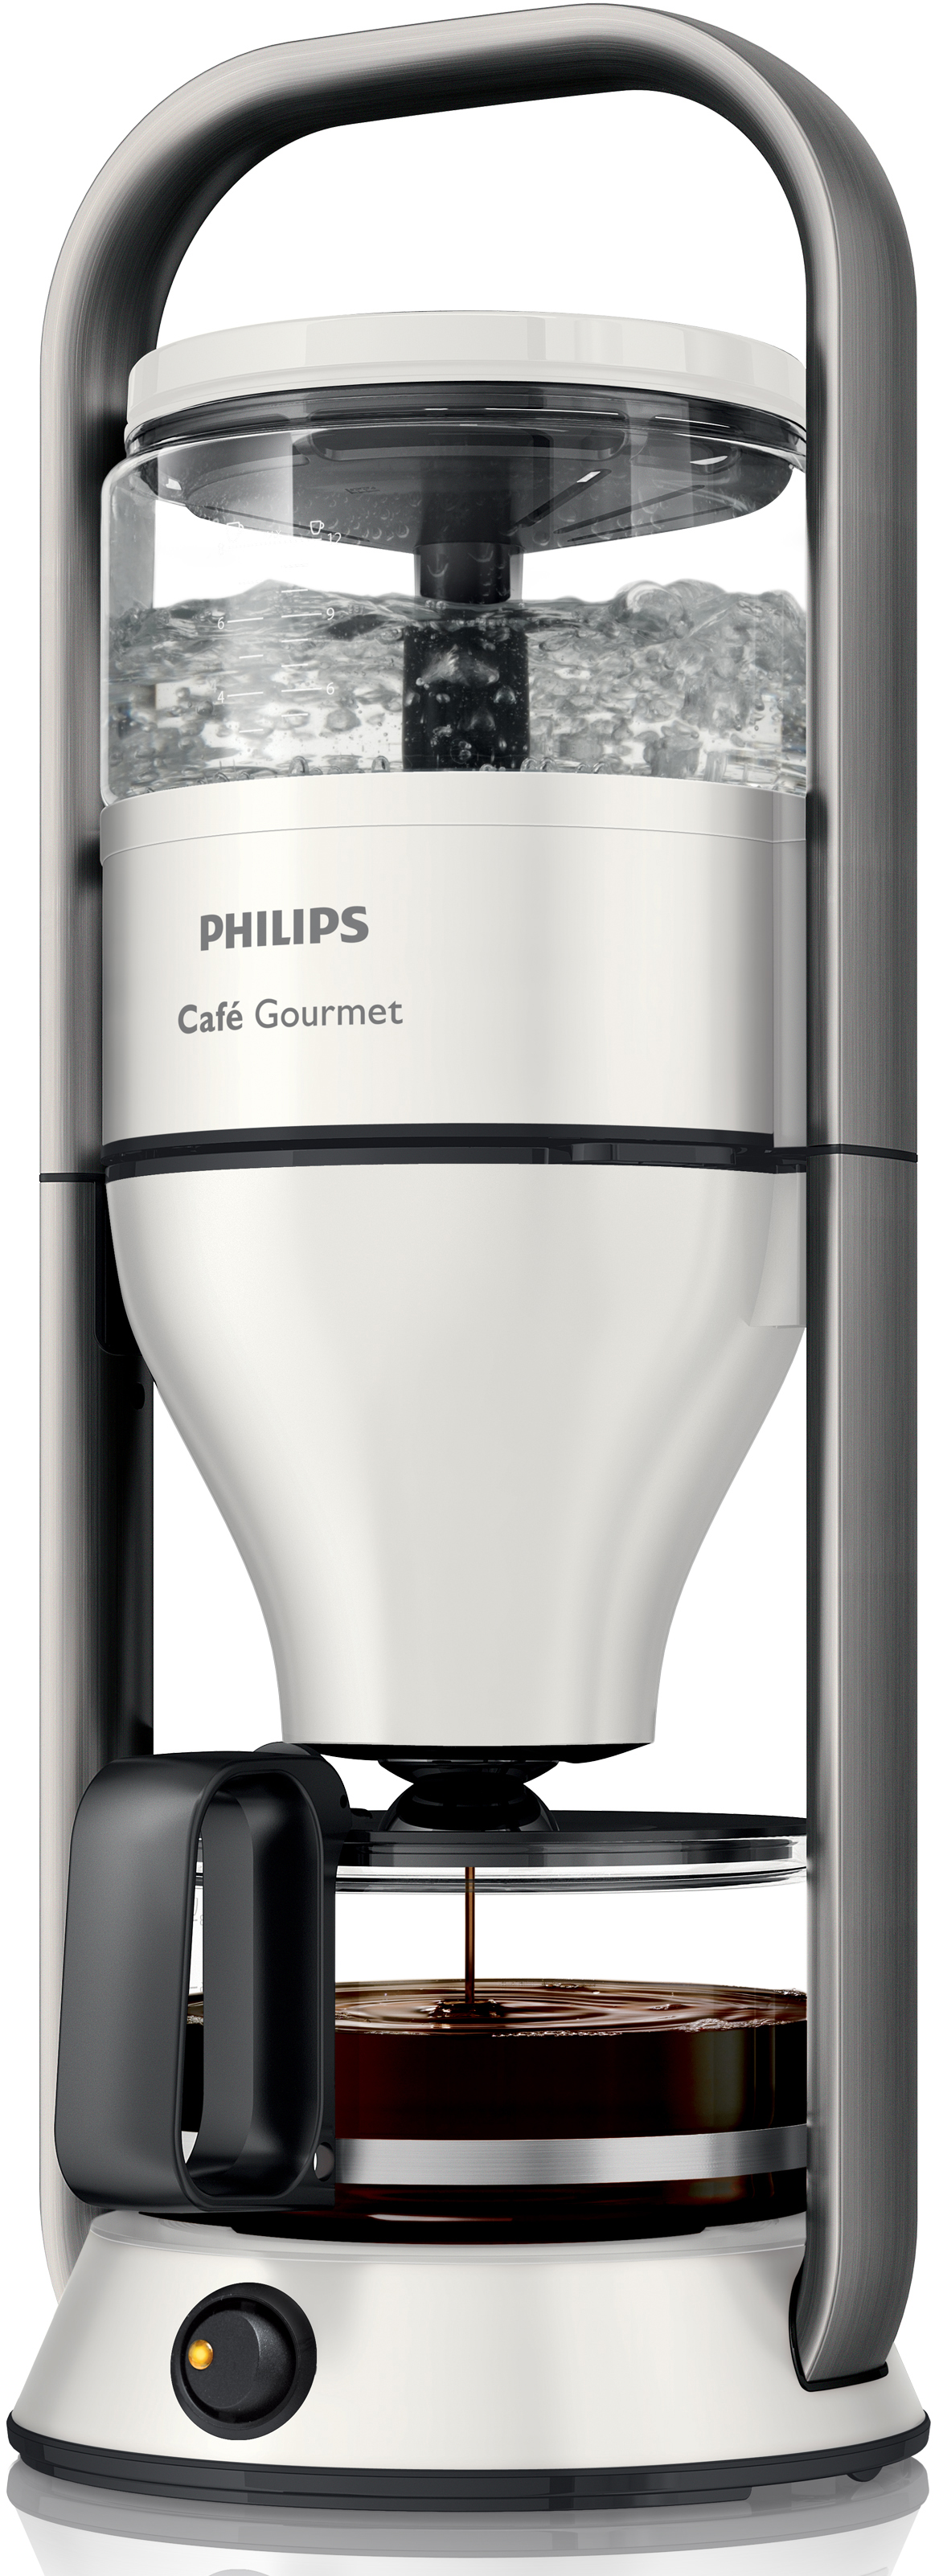 philips kaffeemaschine caf gourmet hd5407 10. Black Bedroom Furniture Sets. Home Design Ideas